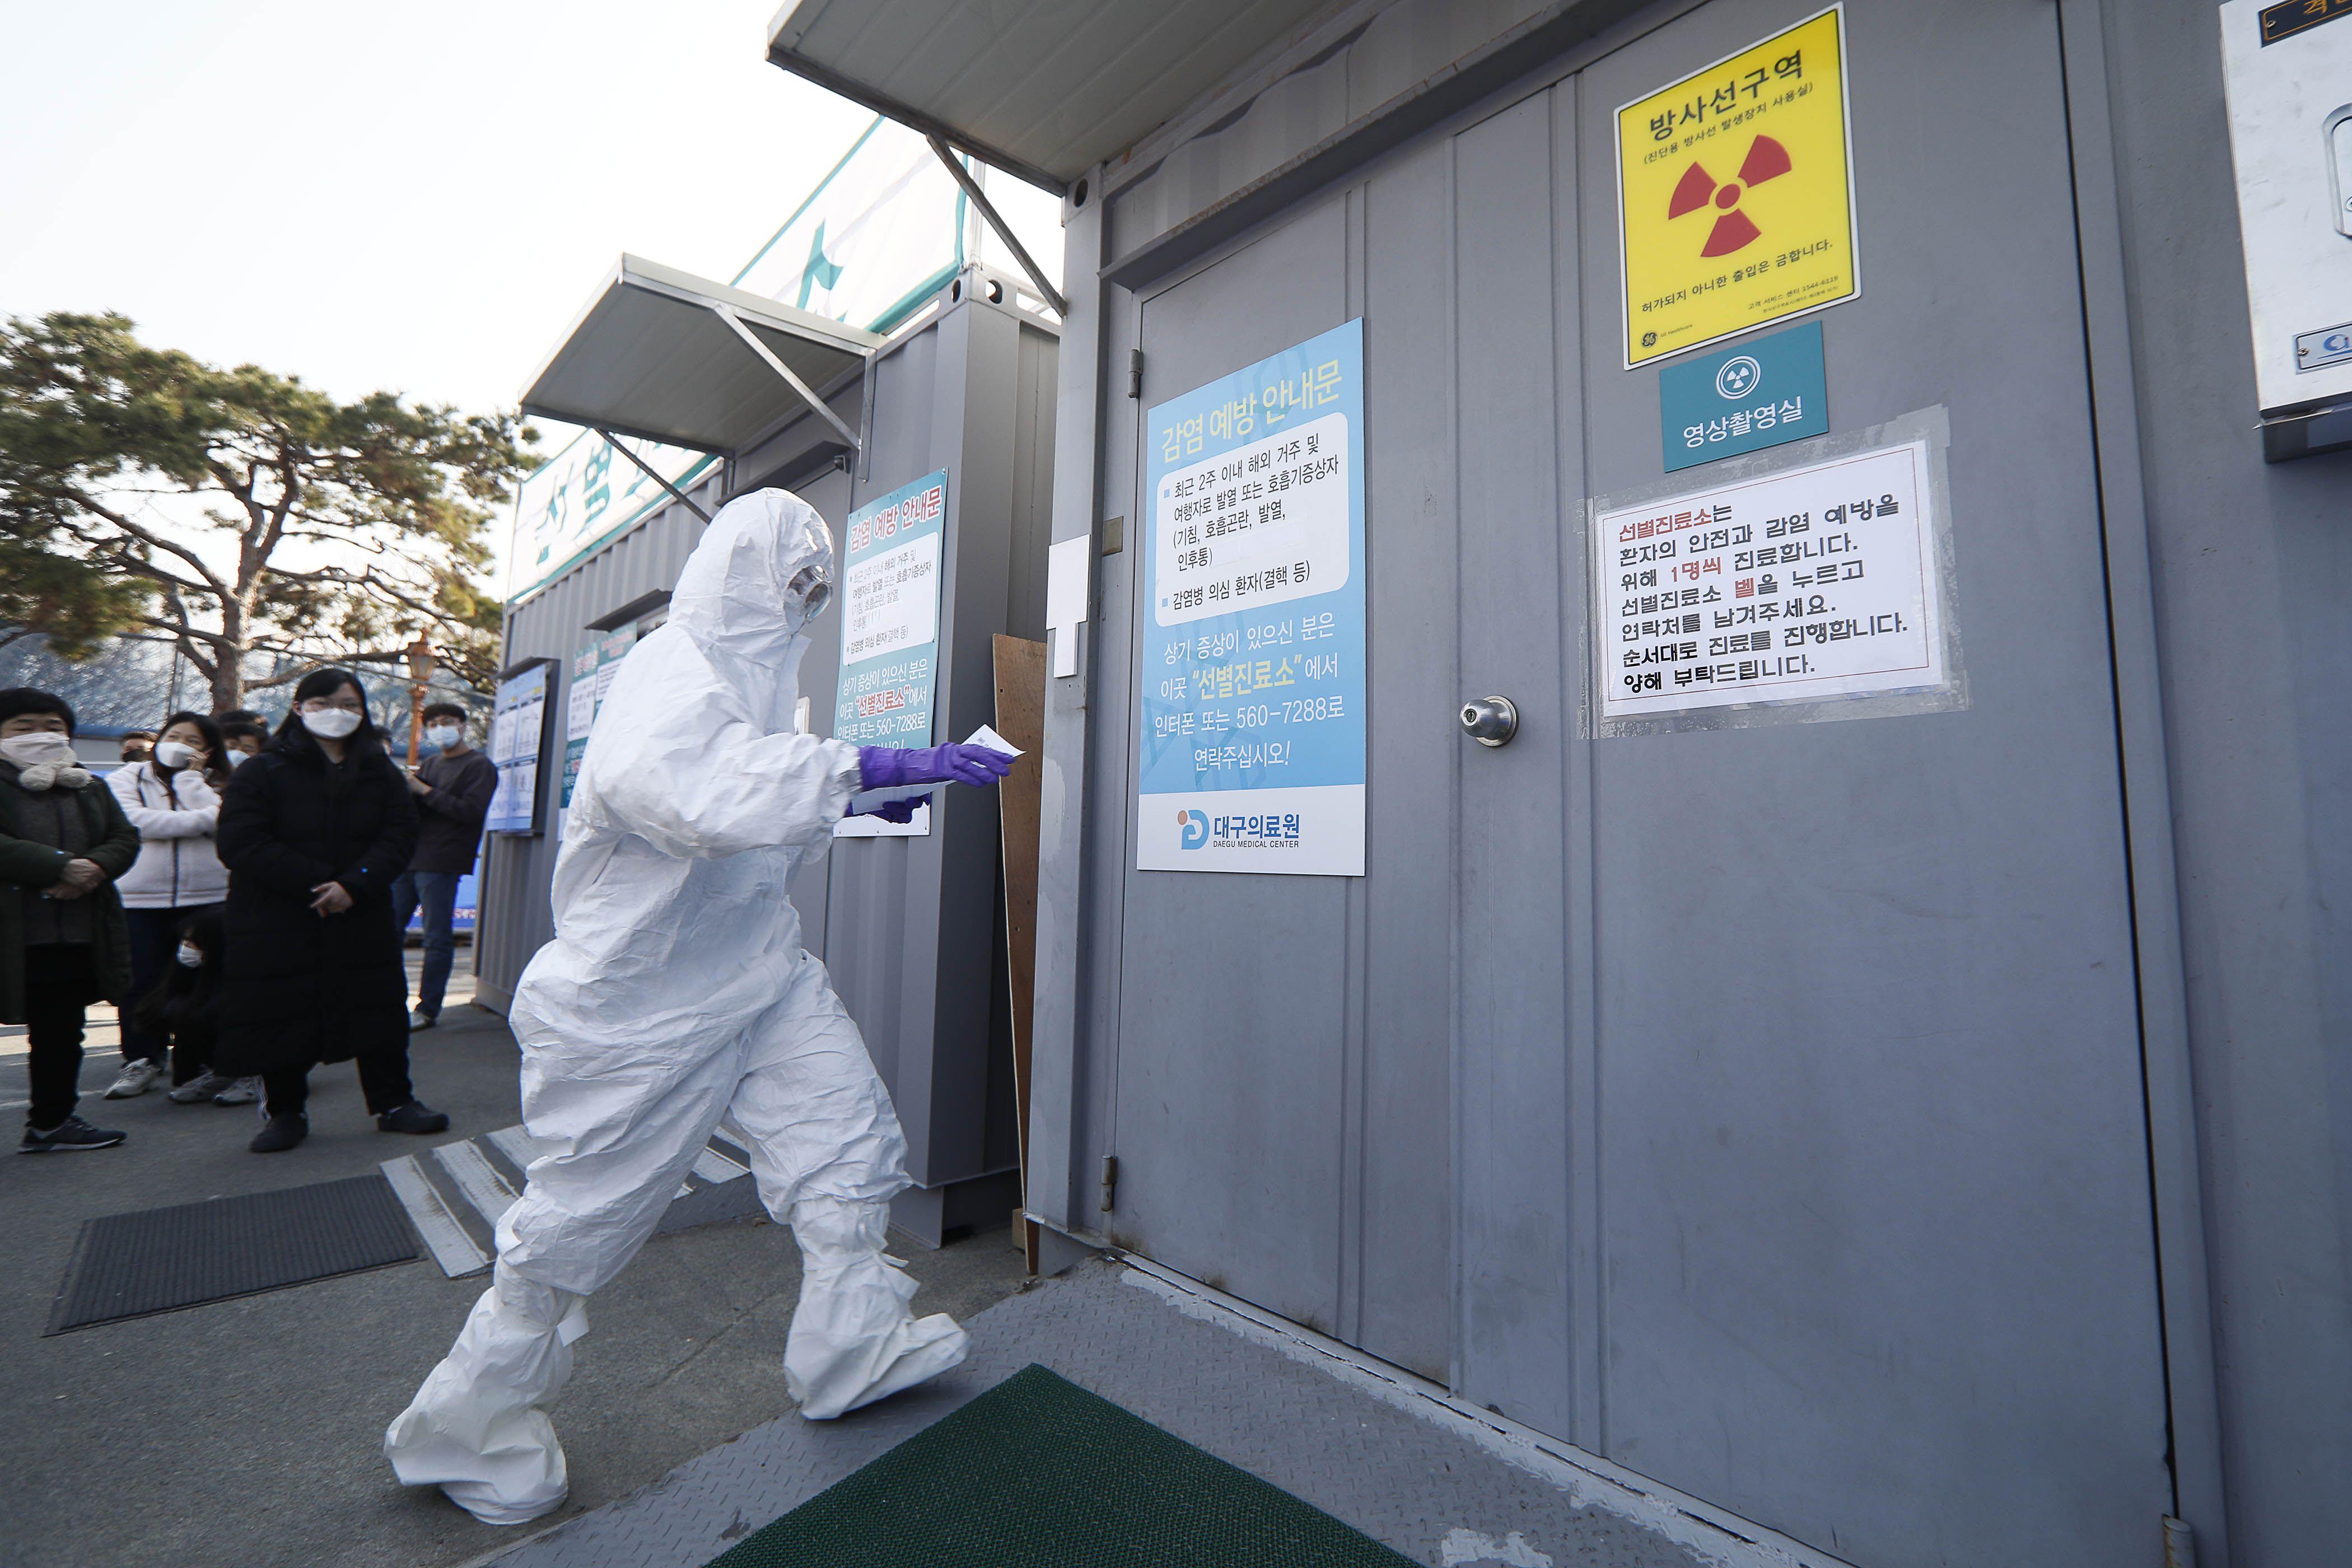 South Korea on red alert as coronavirus cases soar past 600 - Axios